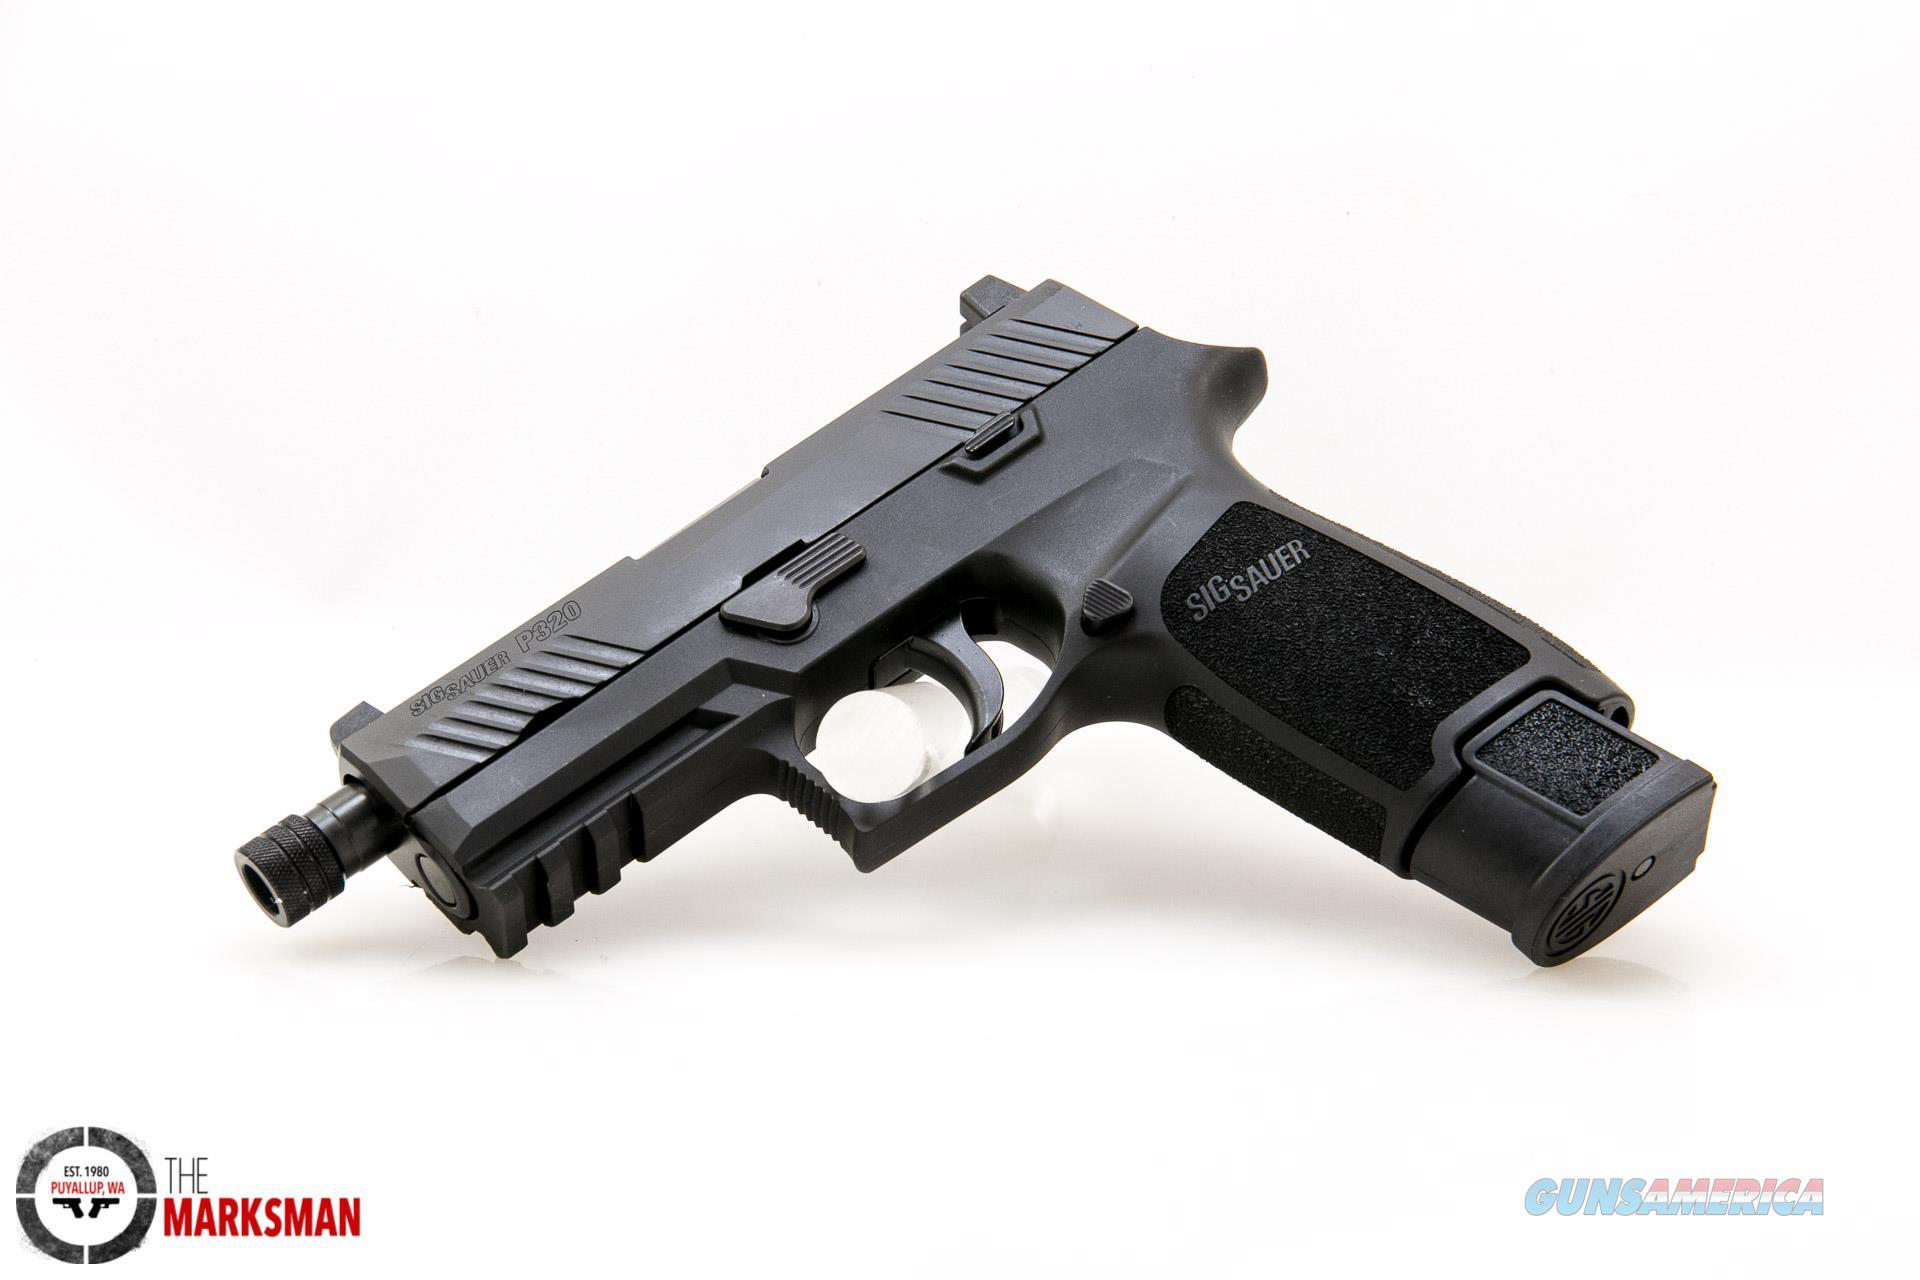 Sig Sauer P320 TacOps 9mm NEW Threaded Barrel  Guns > Pistols > Sig - Sauer/Sigarms Pistols > P320